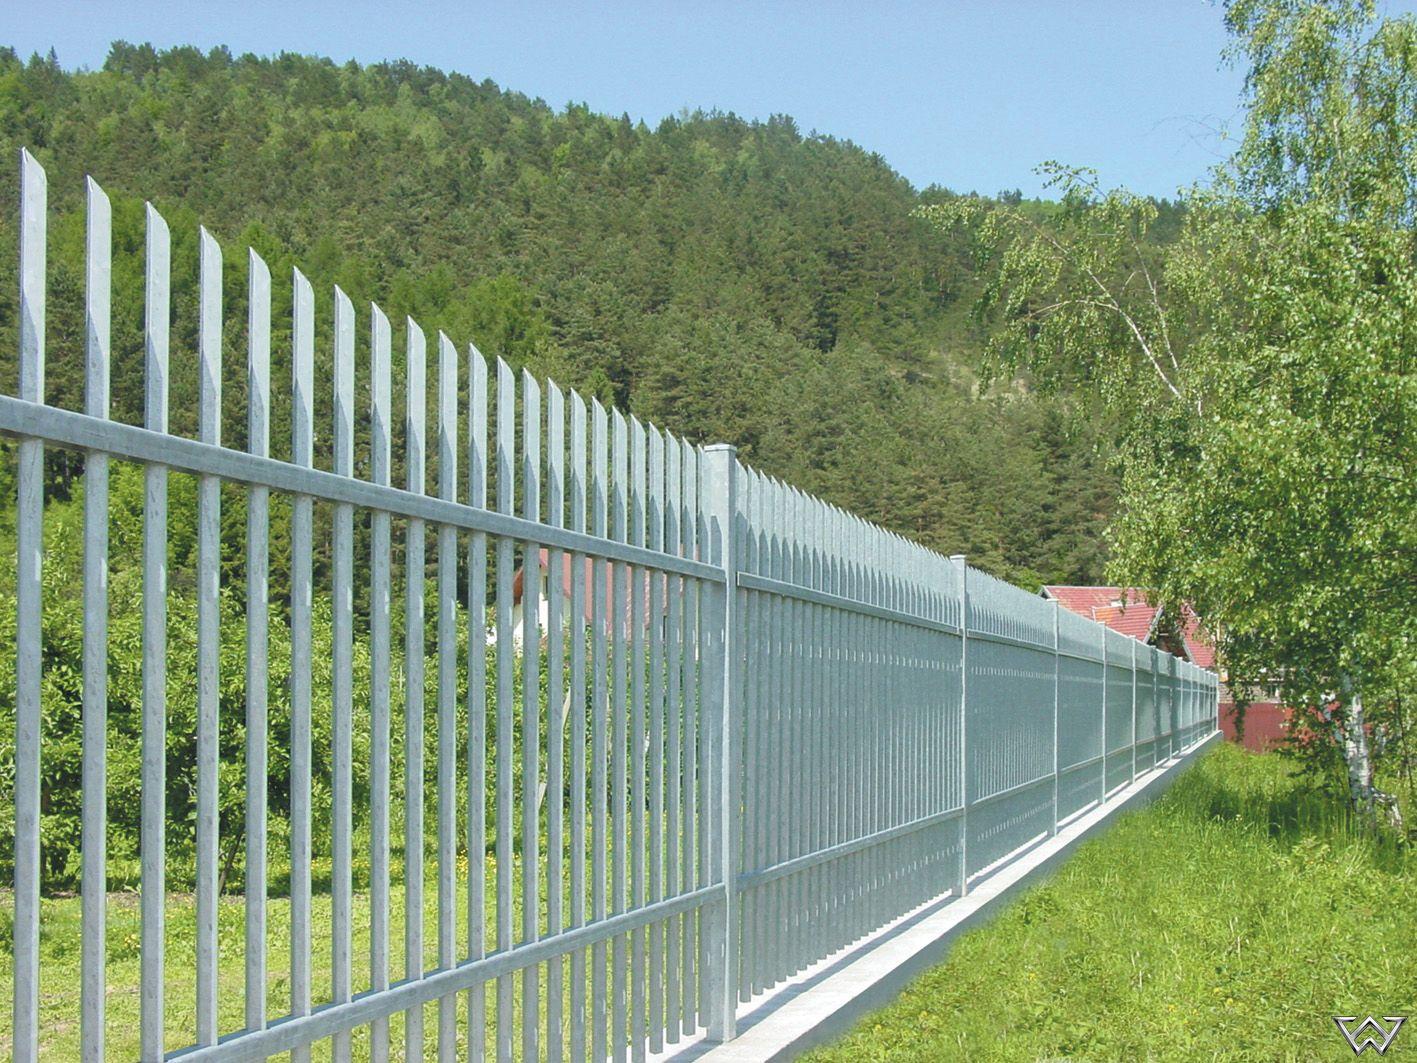 Moderne Stahlzaune Aussengelander Zaun Stahlzaun